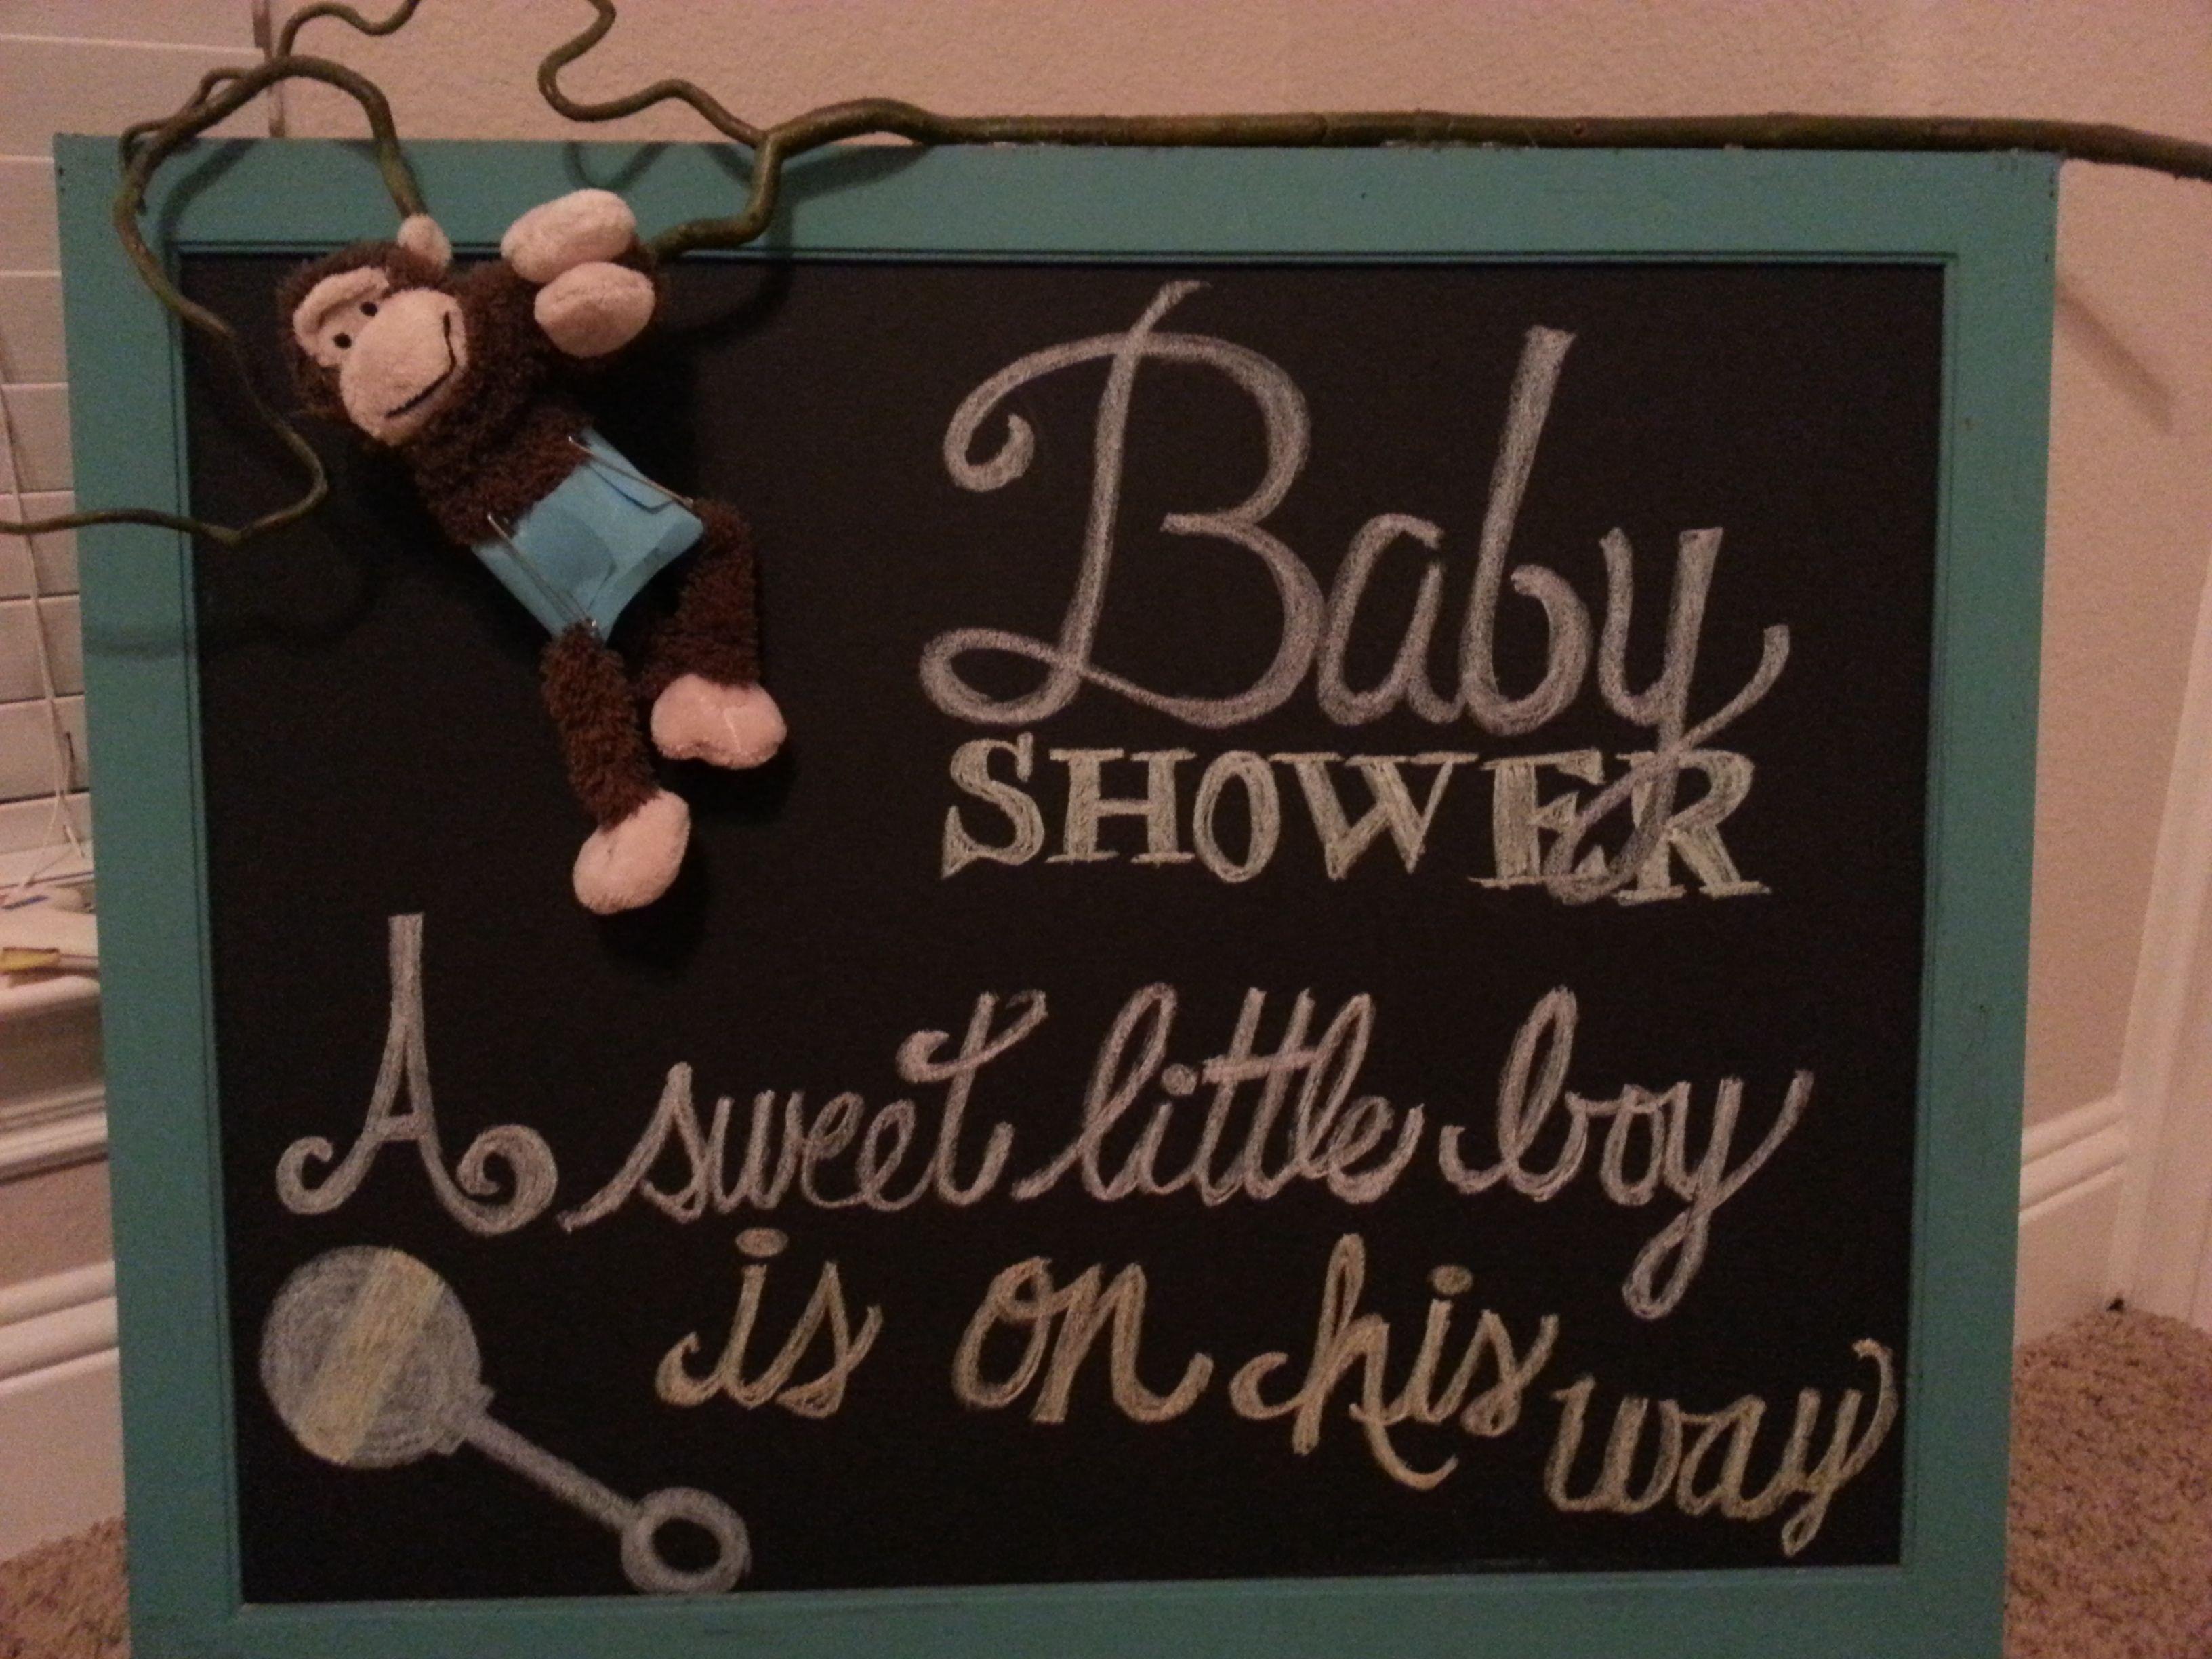 Baby Boy Shower Decor Painted Teal Frame Black Poster Board